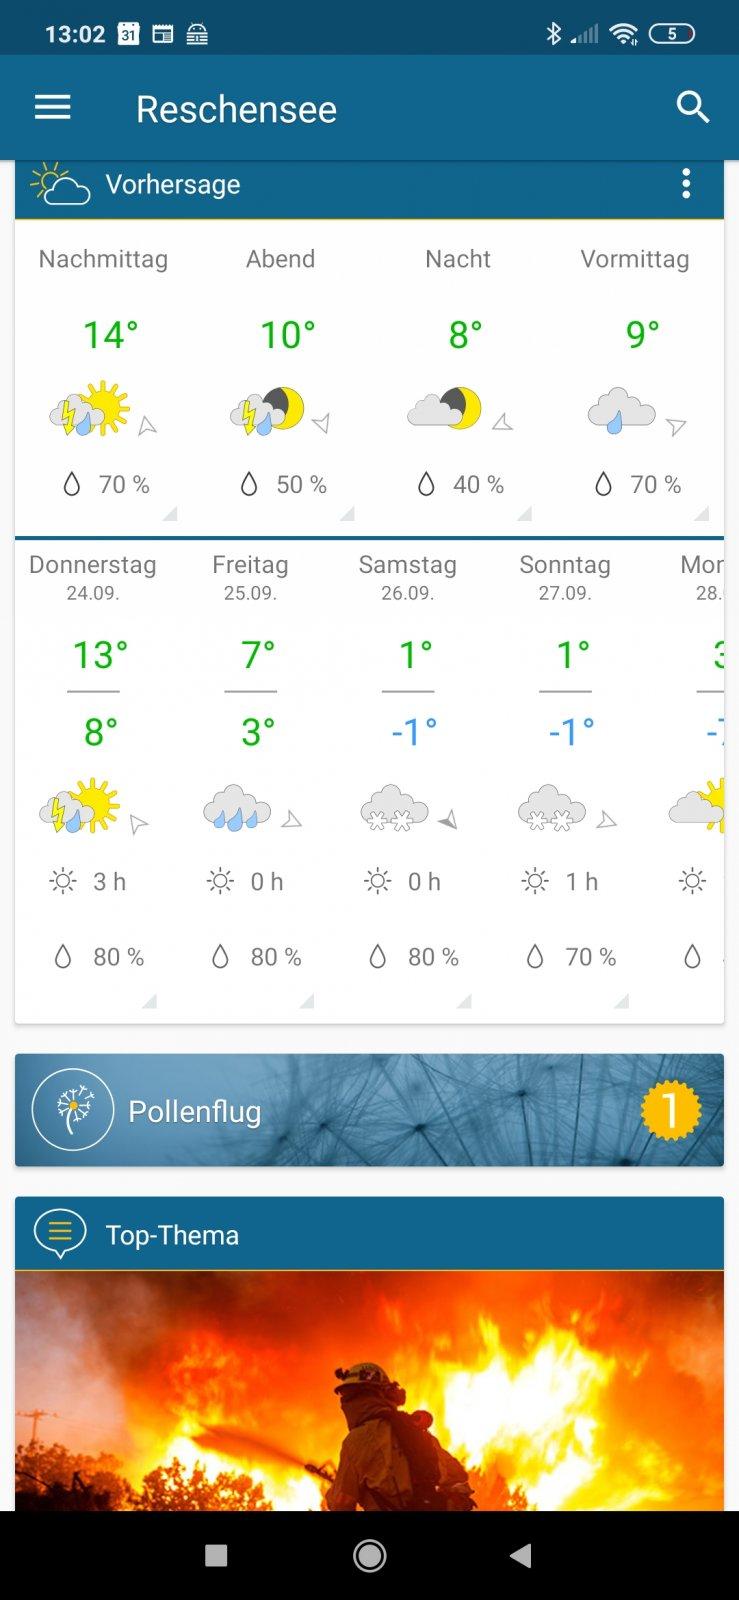 Screenshot_2020-09-22-13-02-29-130_de.wetteronline.wetterapp.jpg